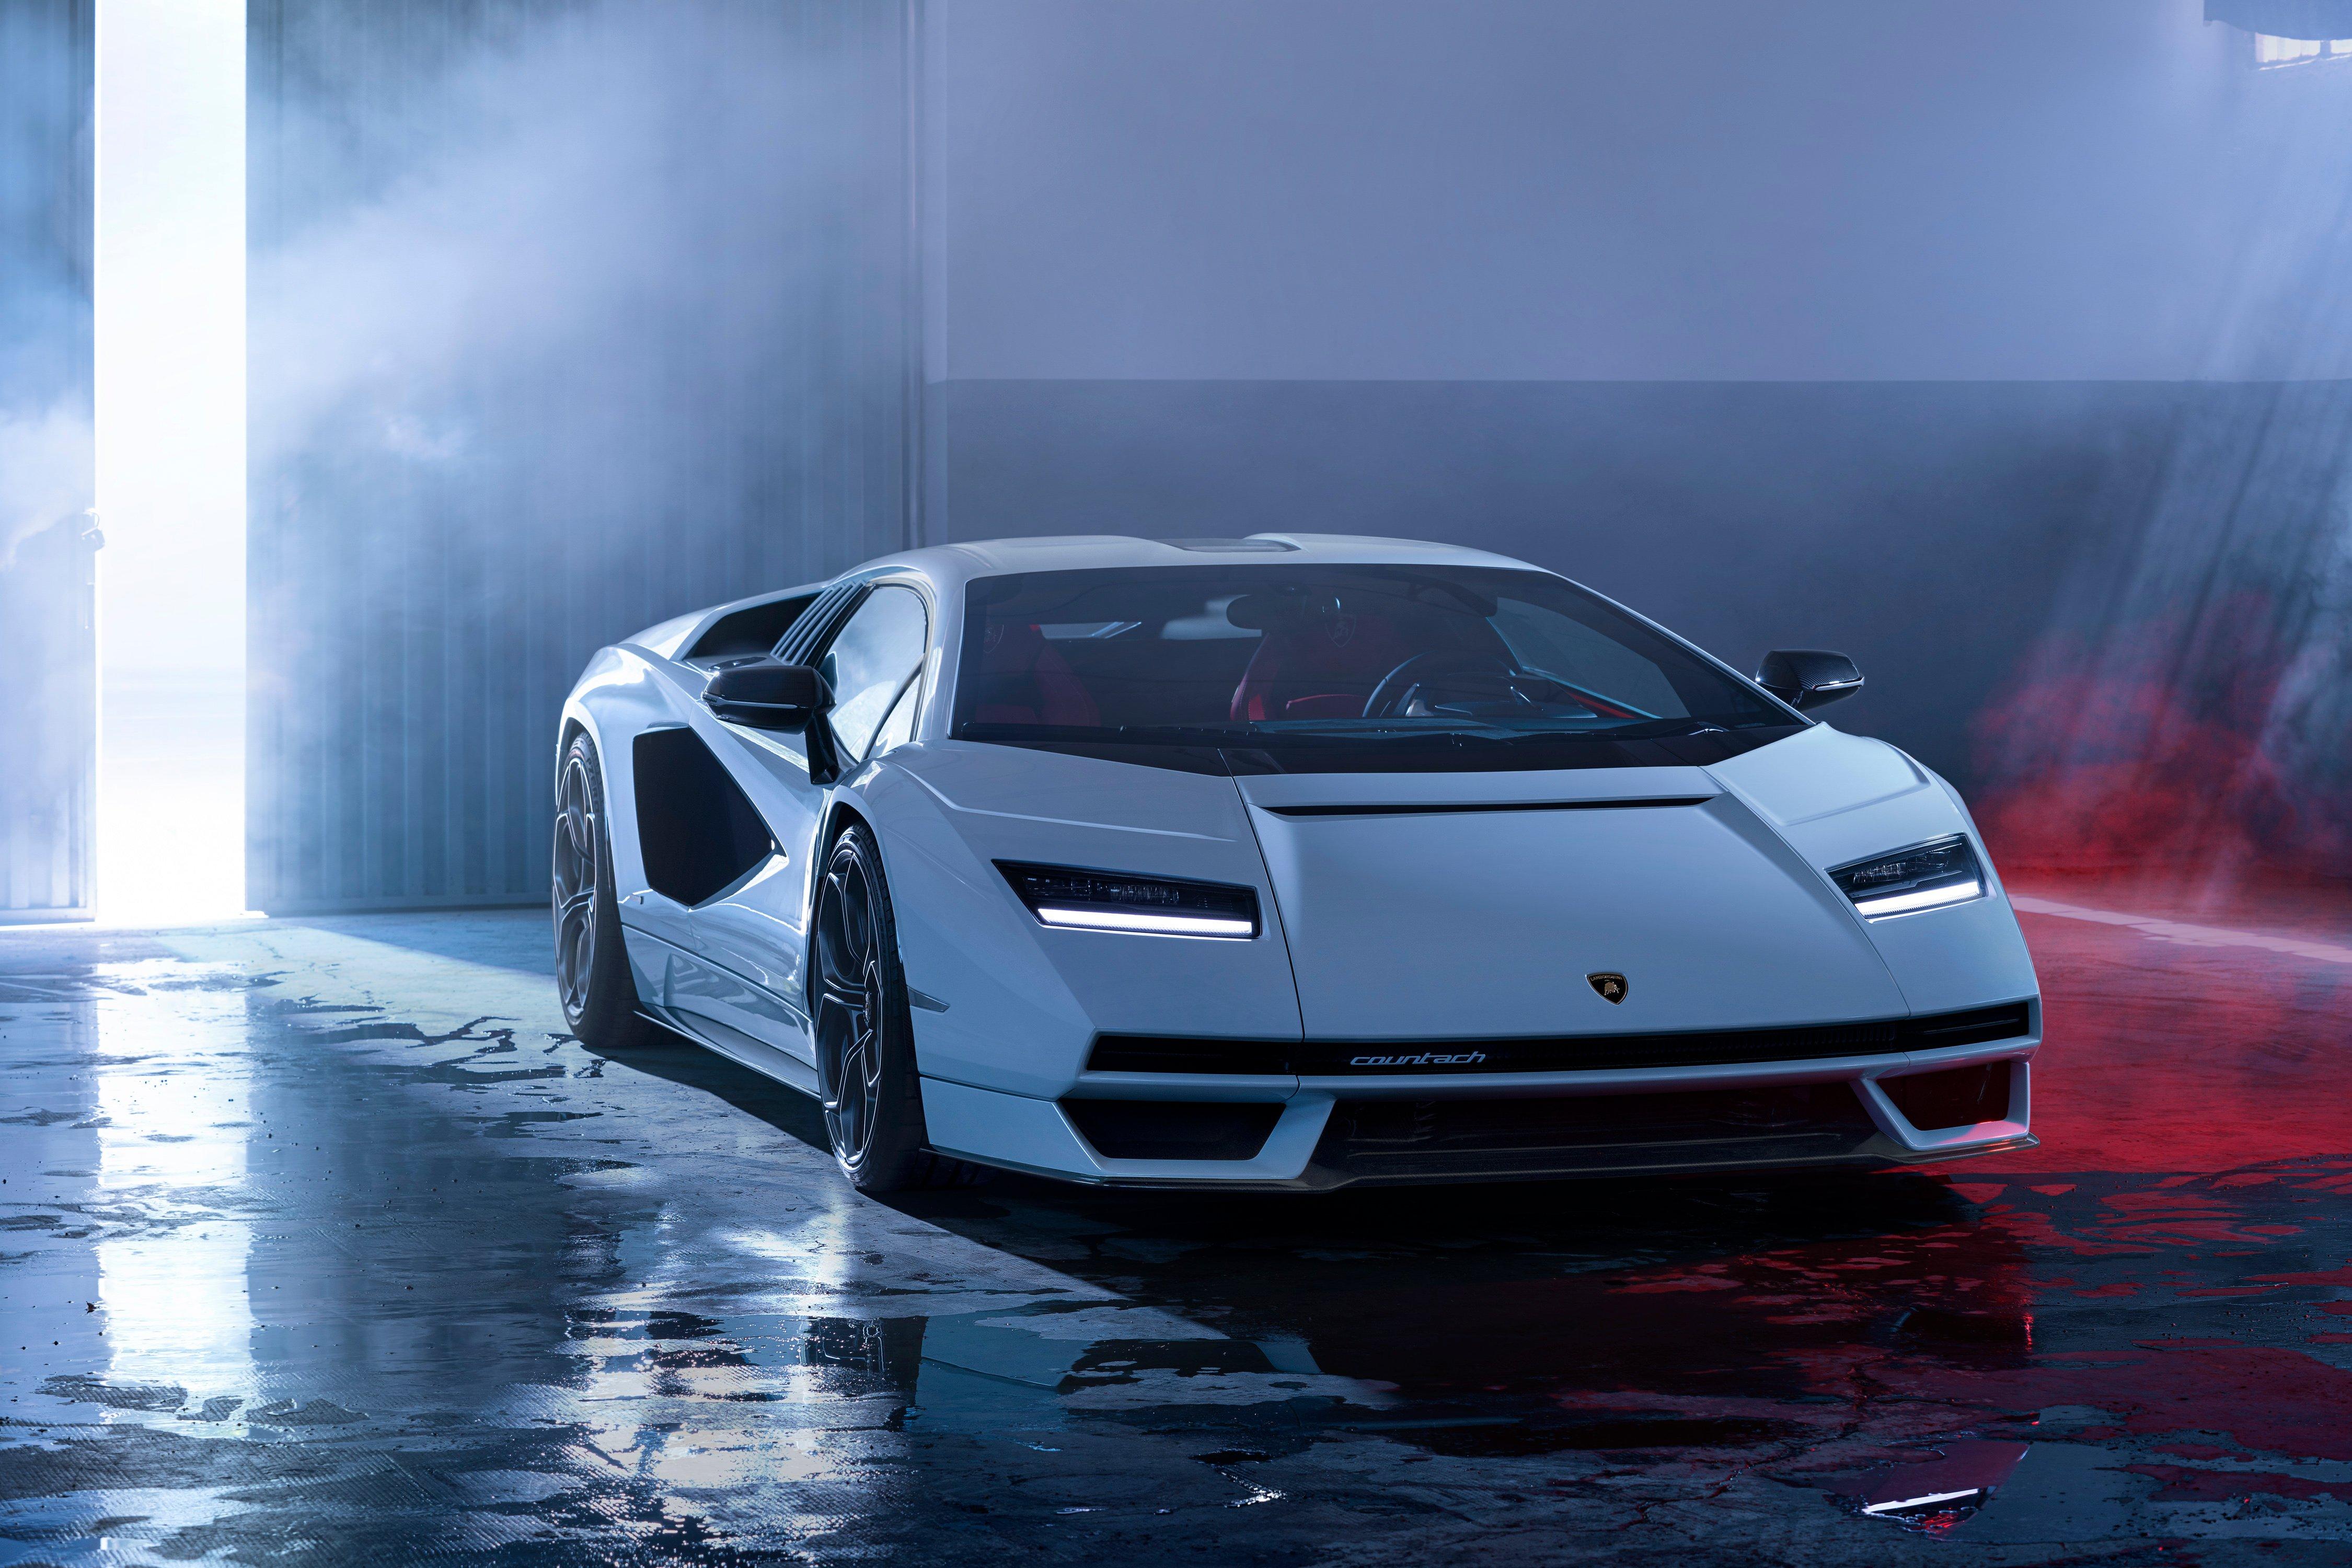 Fondos de pantalla Lamborghini Countach LPI 800